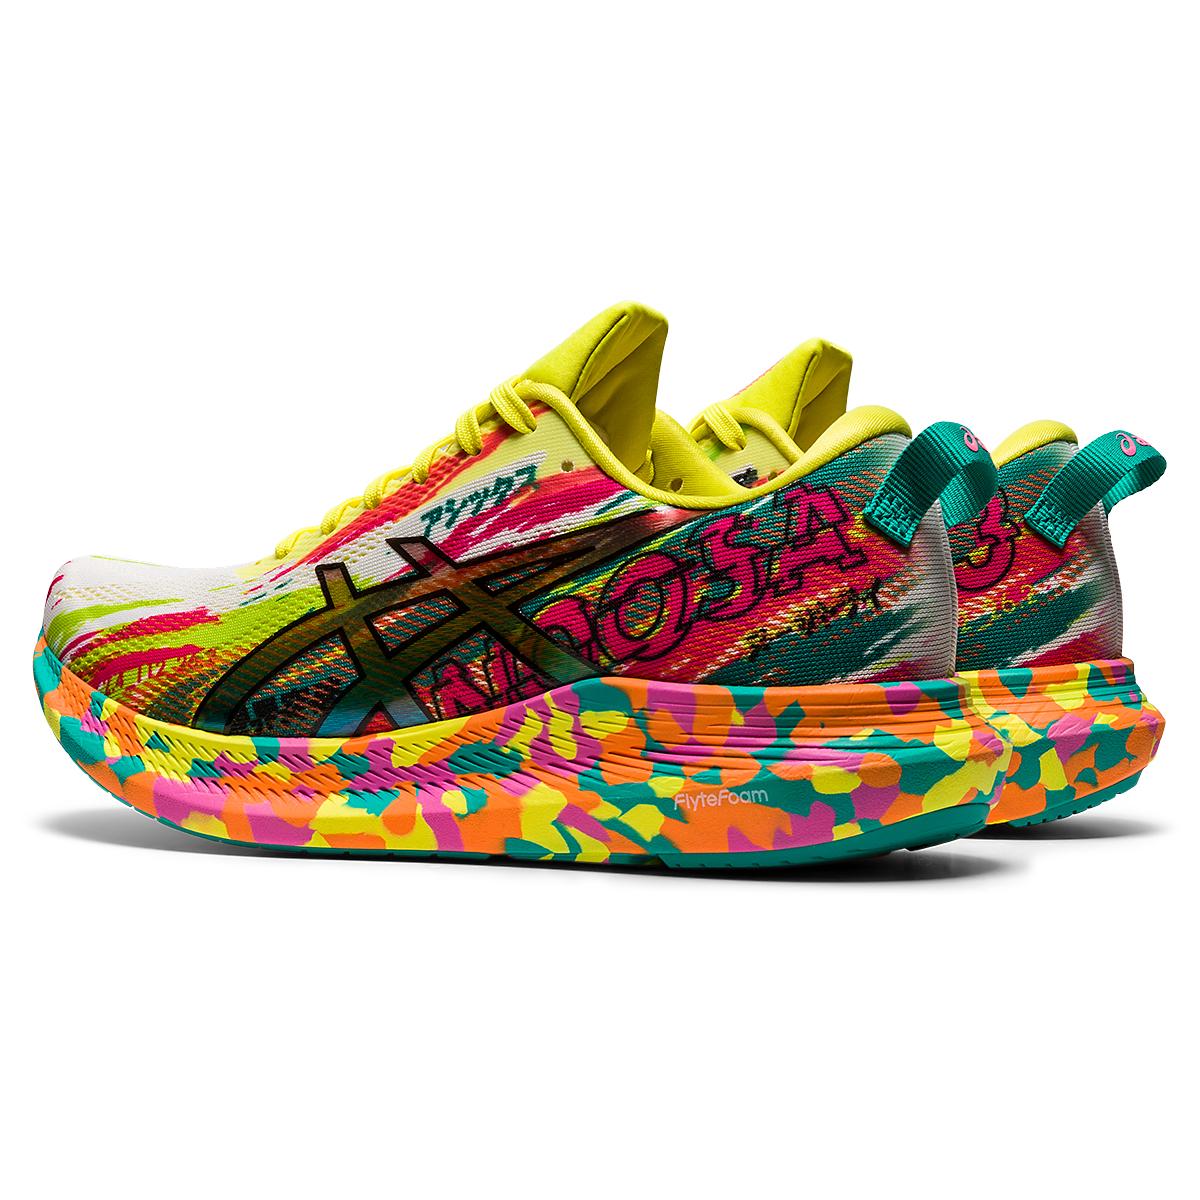 Women's Asics Noosa Tri 13 Running Shoe - Color: Hot Pink/Sour Yuzu - Size: 5 - Width: Regular, Hot Pink/Sour Yuzu, large, image 5